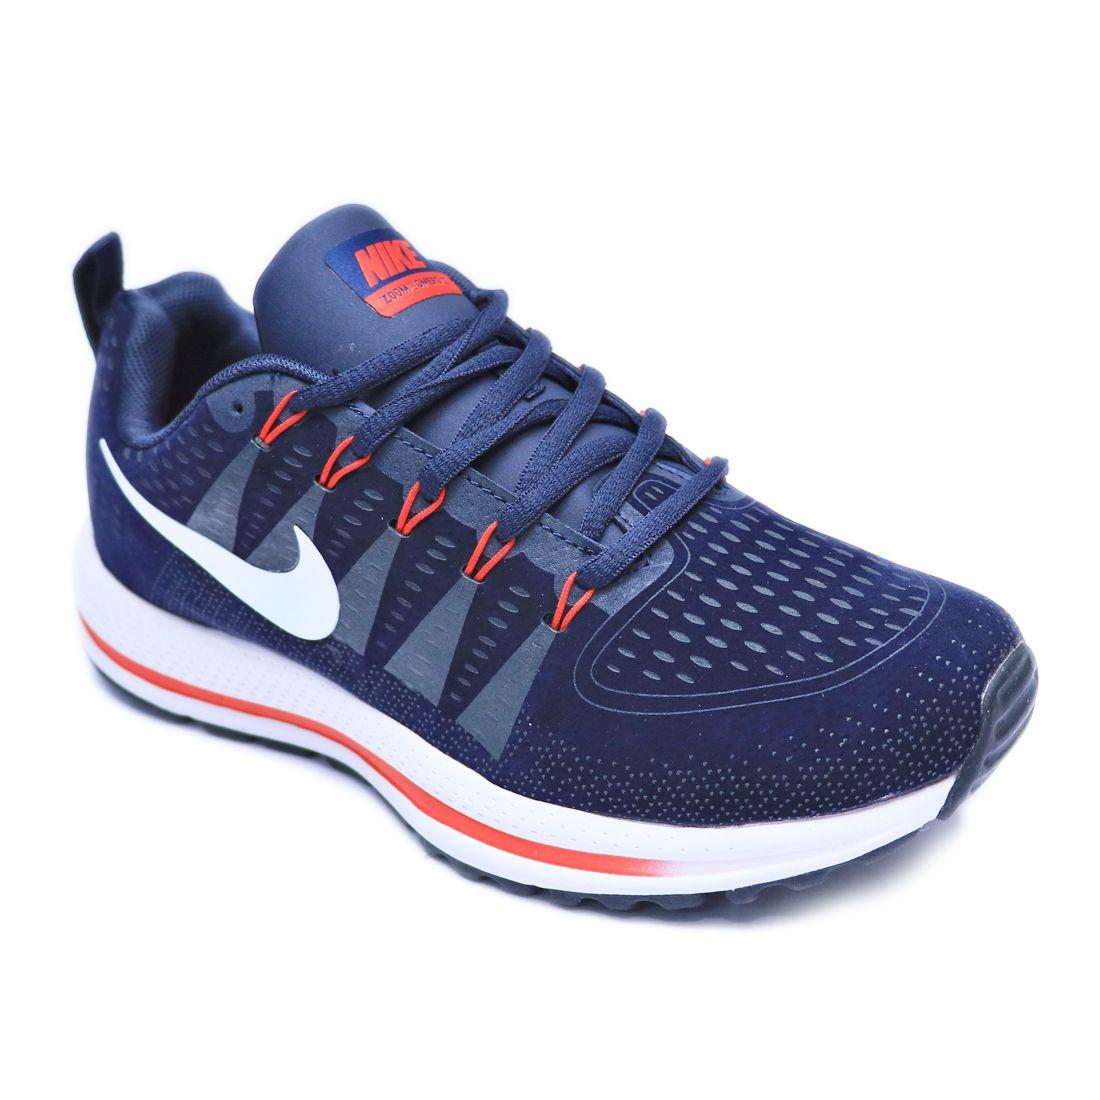 66ac70c33bc Nike Air Zoom Vomero 12 Black Running Shoes